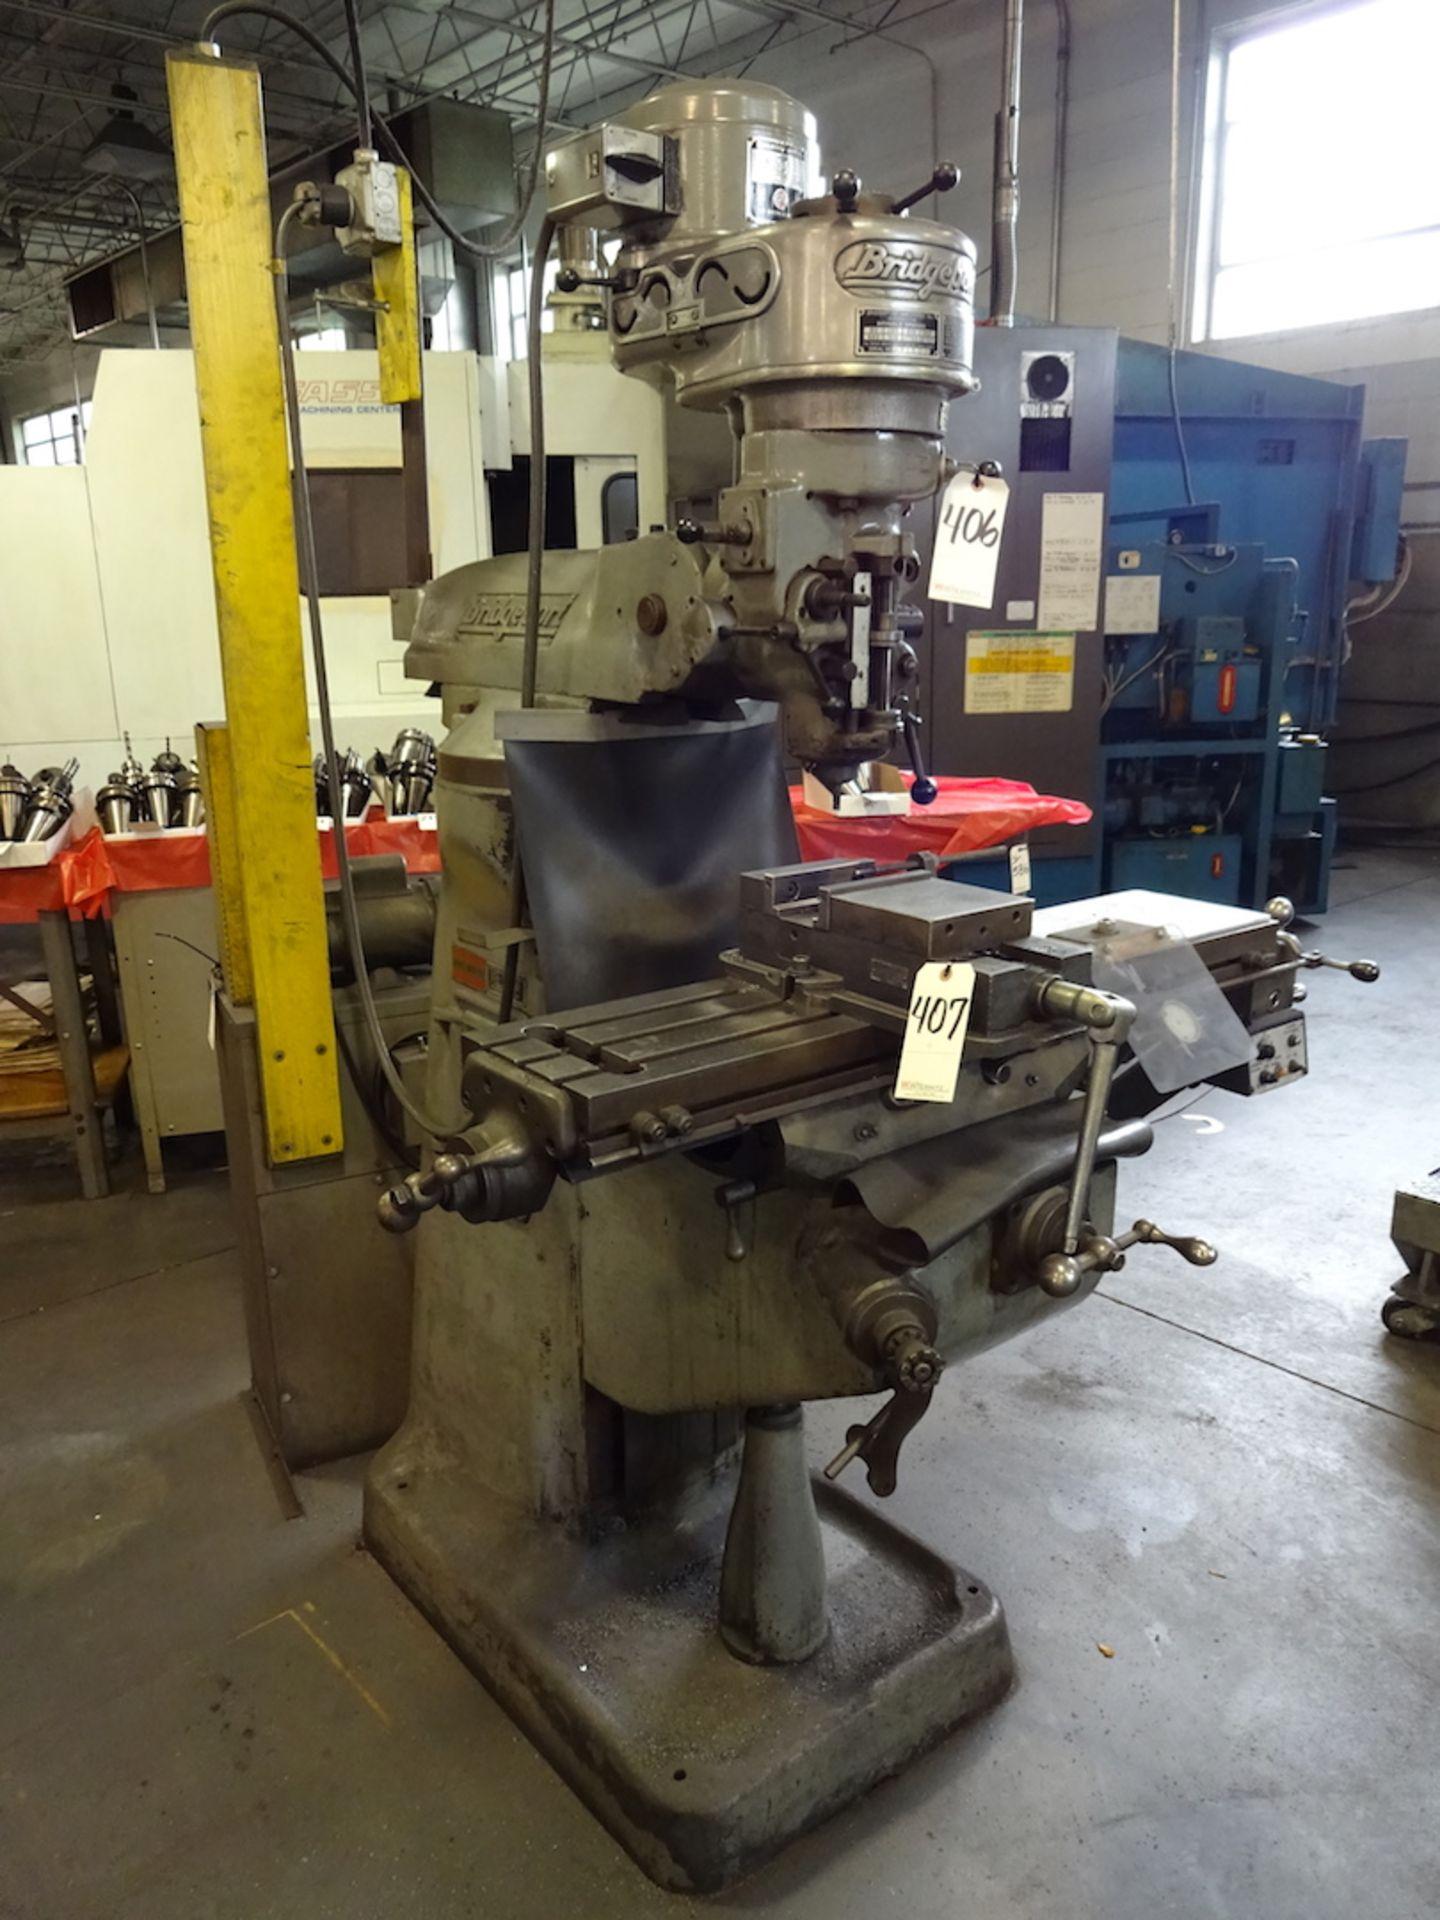 Lot 406 - Bridgeport 1 HP V-Ram Vertical Milling Machine, S/N 12/BR86073, Power Table Feed, 80 - 2720 RPM, 9